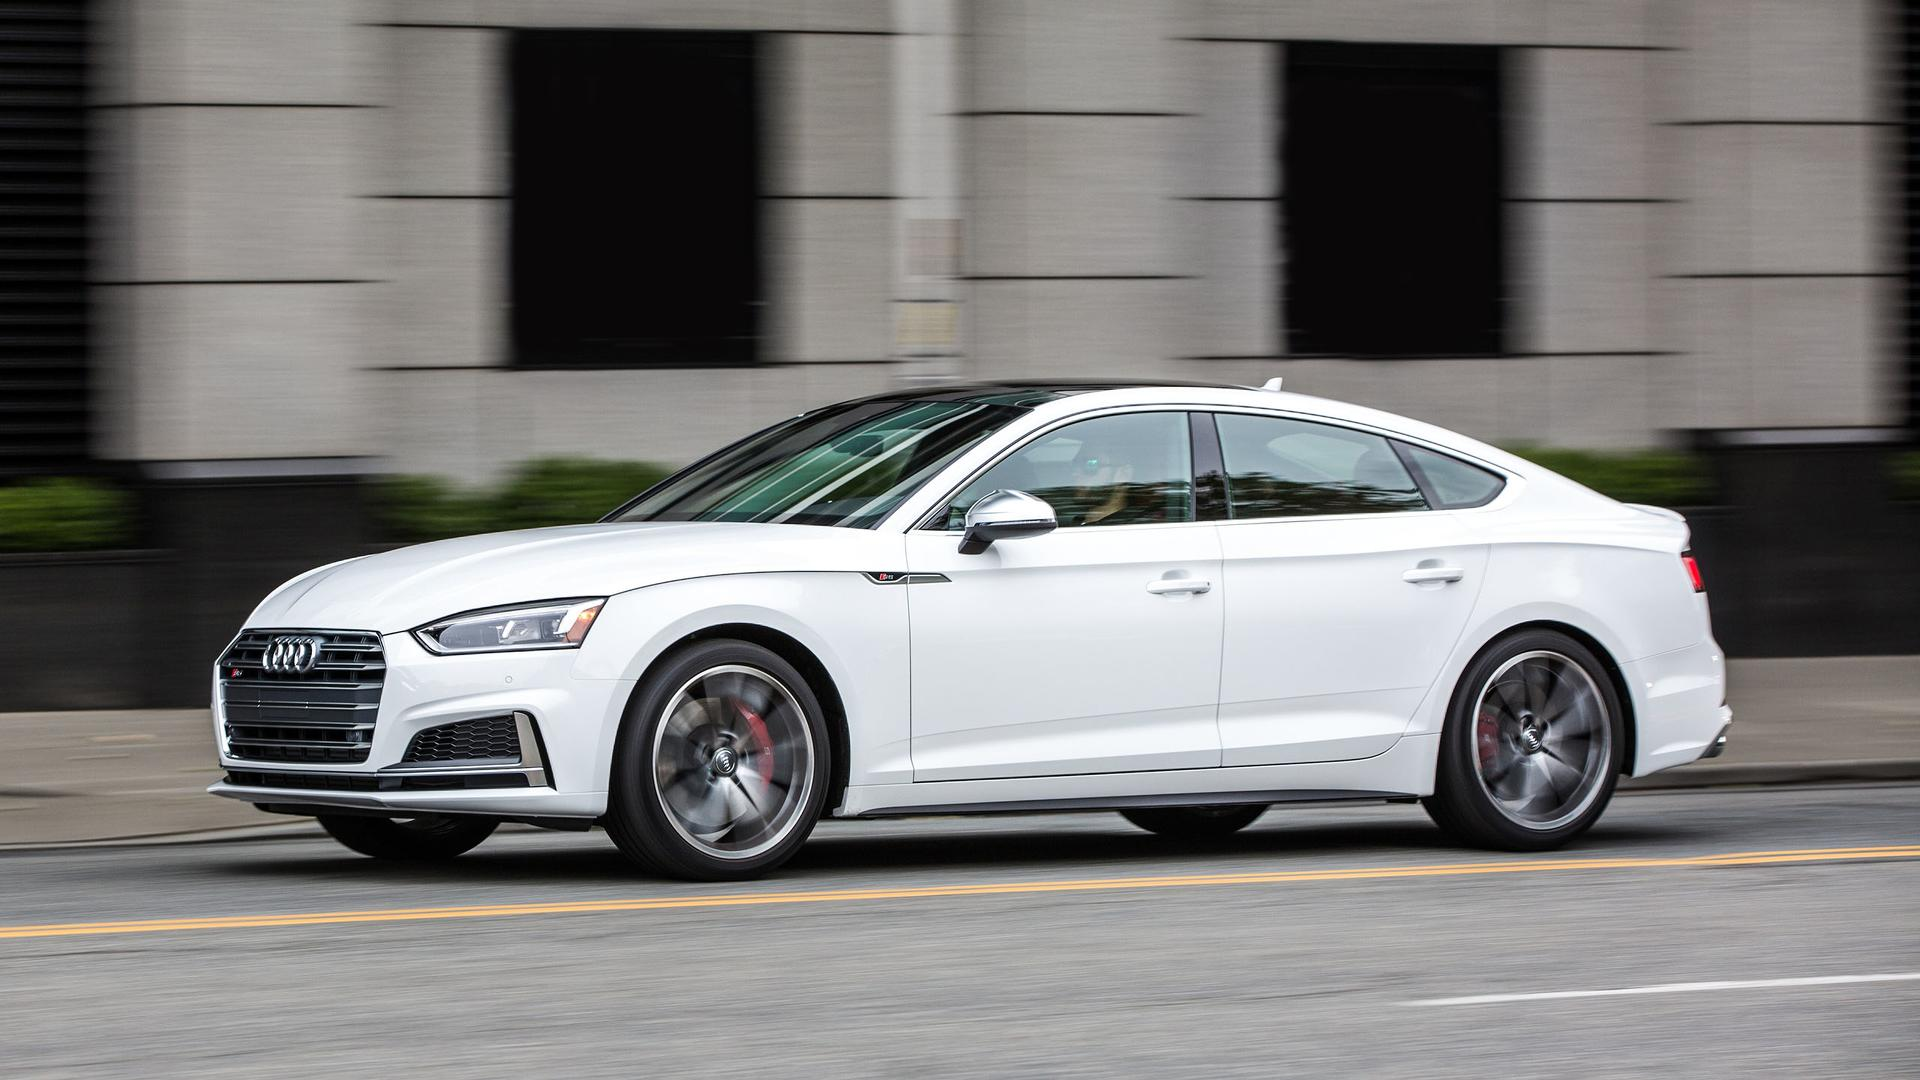 Kelebihan Audi A5 2018 Murah Berkualitas